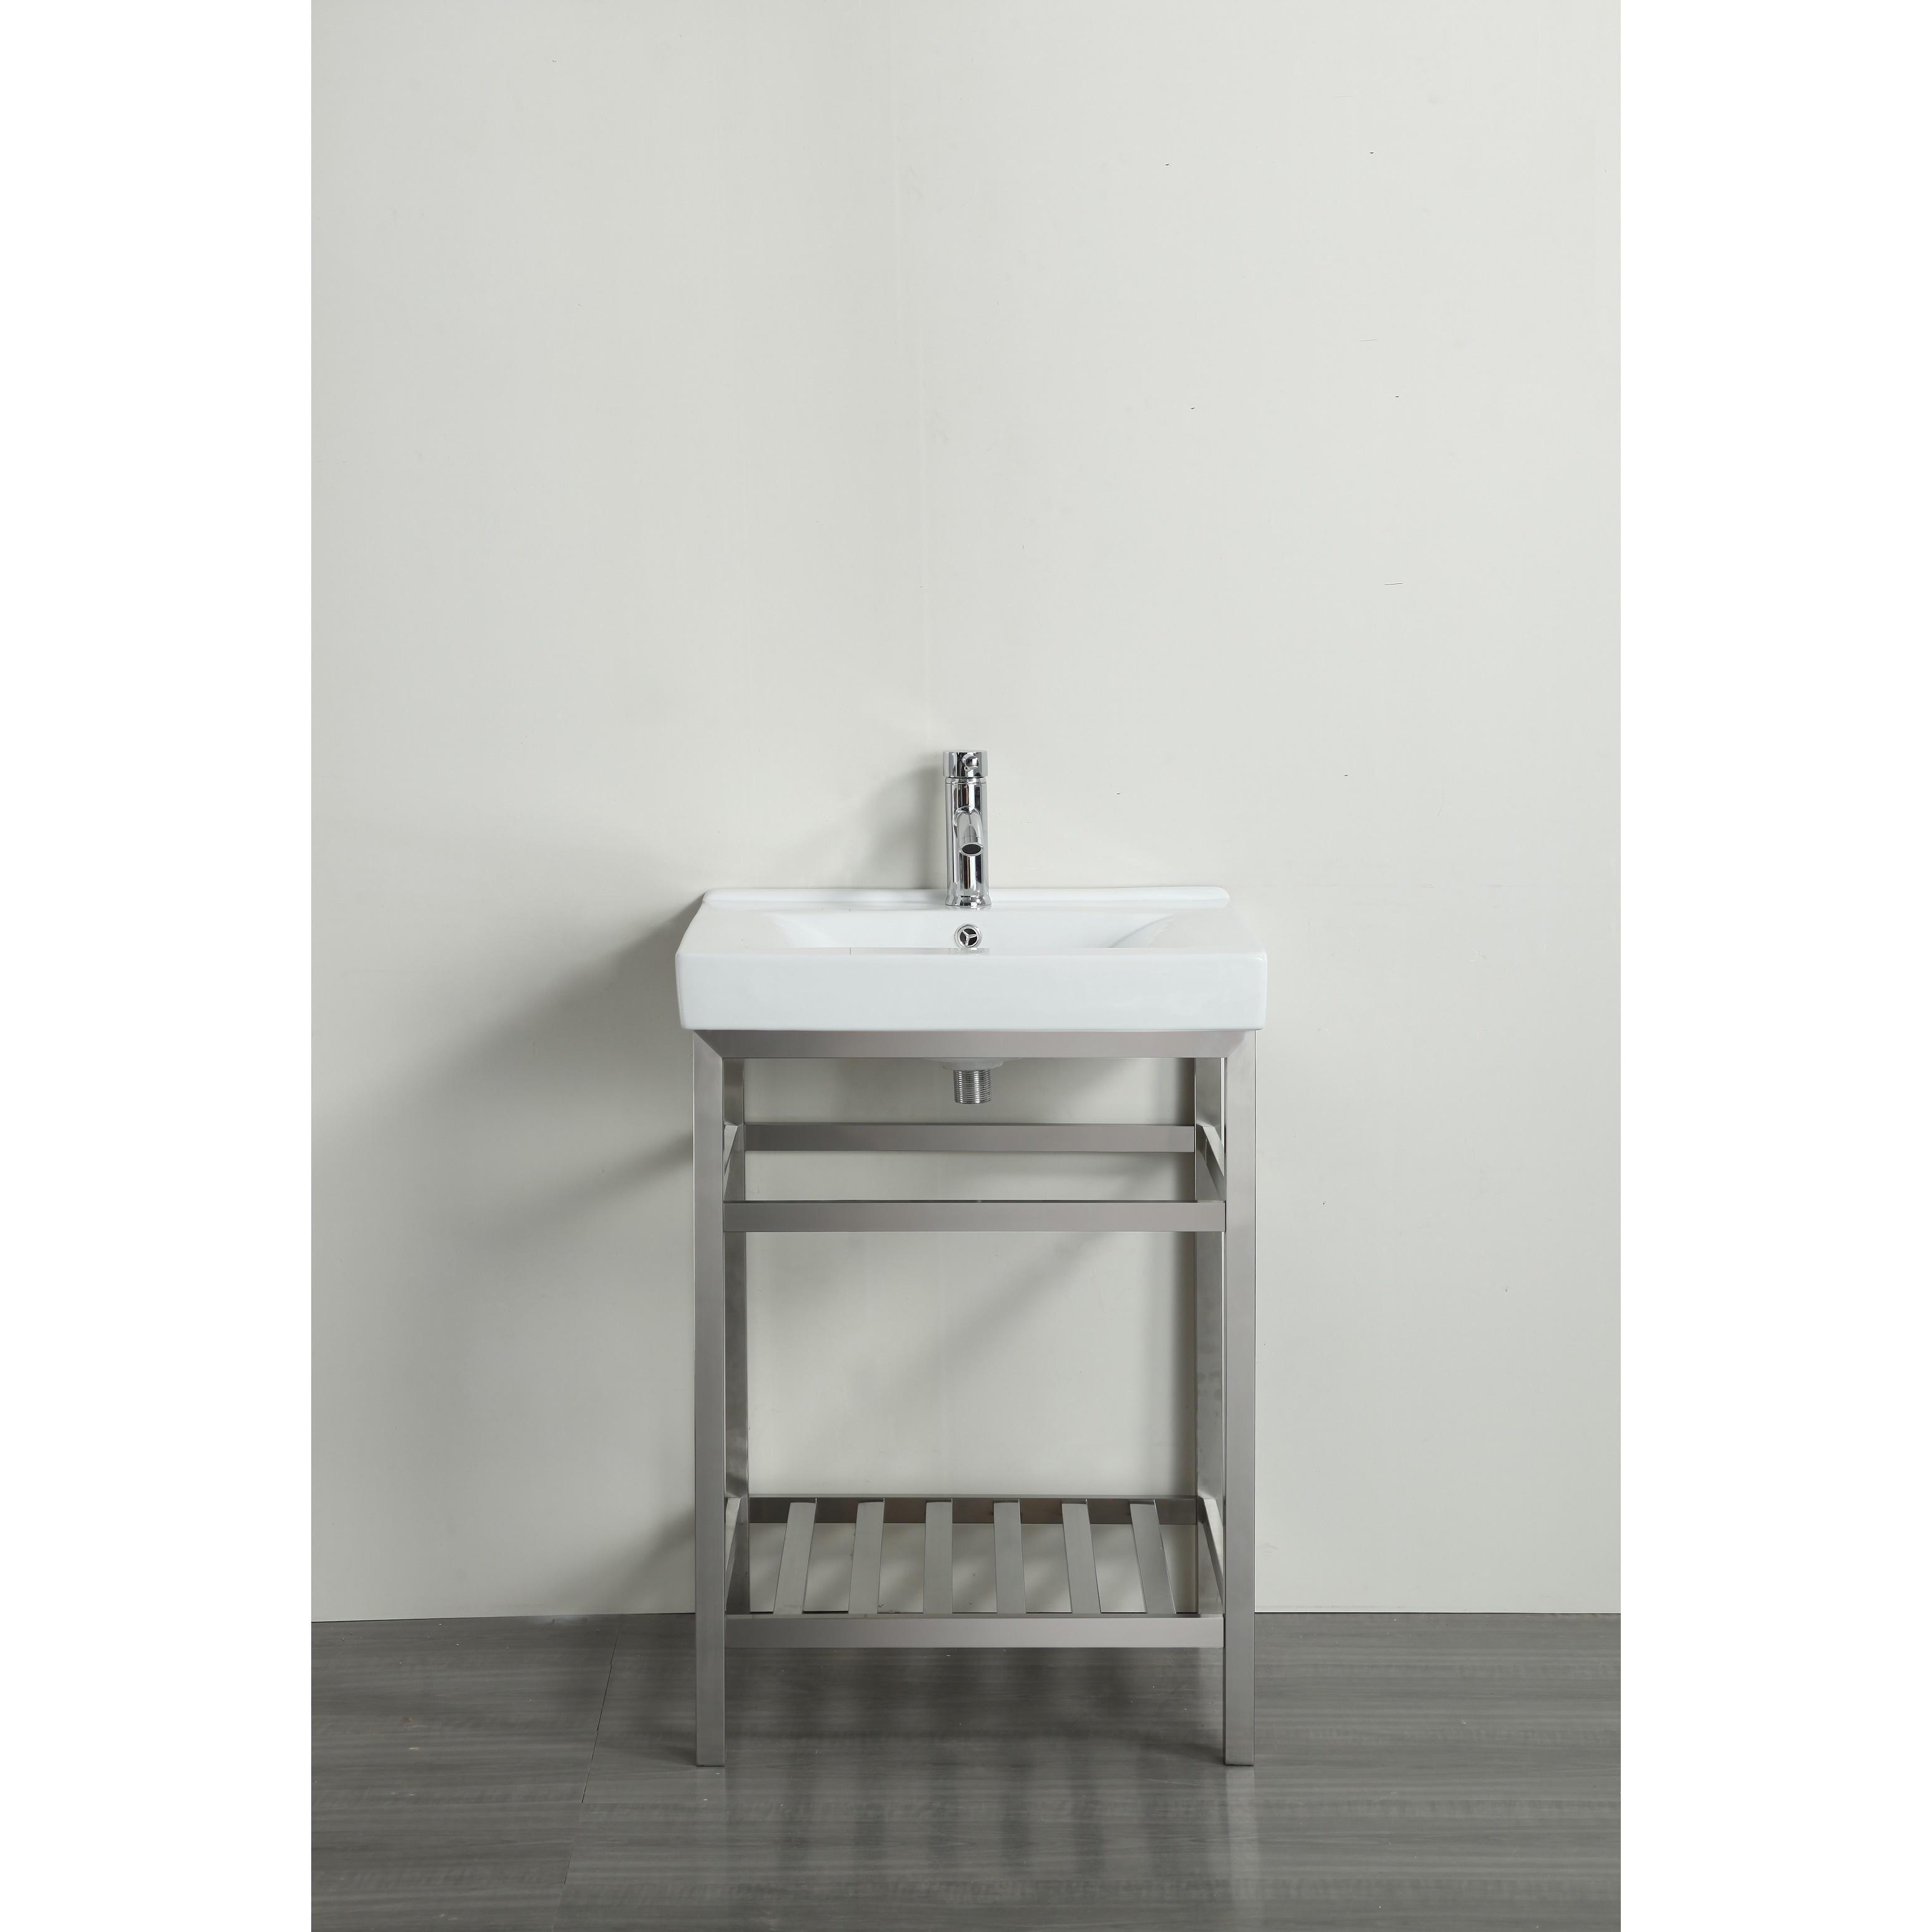 Stainless Steel Bathroom Vanity - Restaurant Interior Design Drawing •